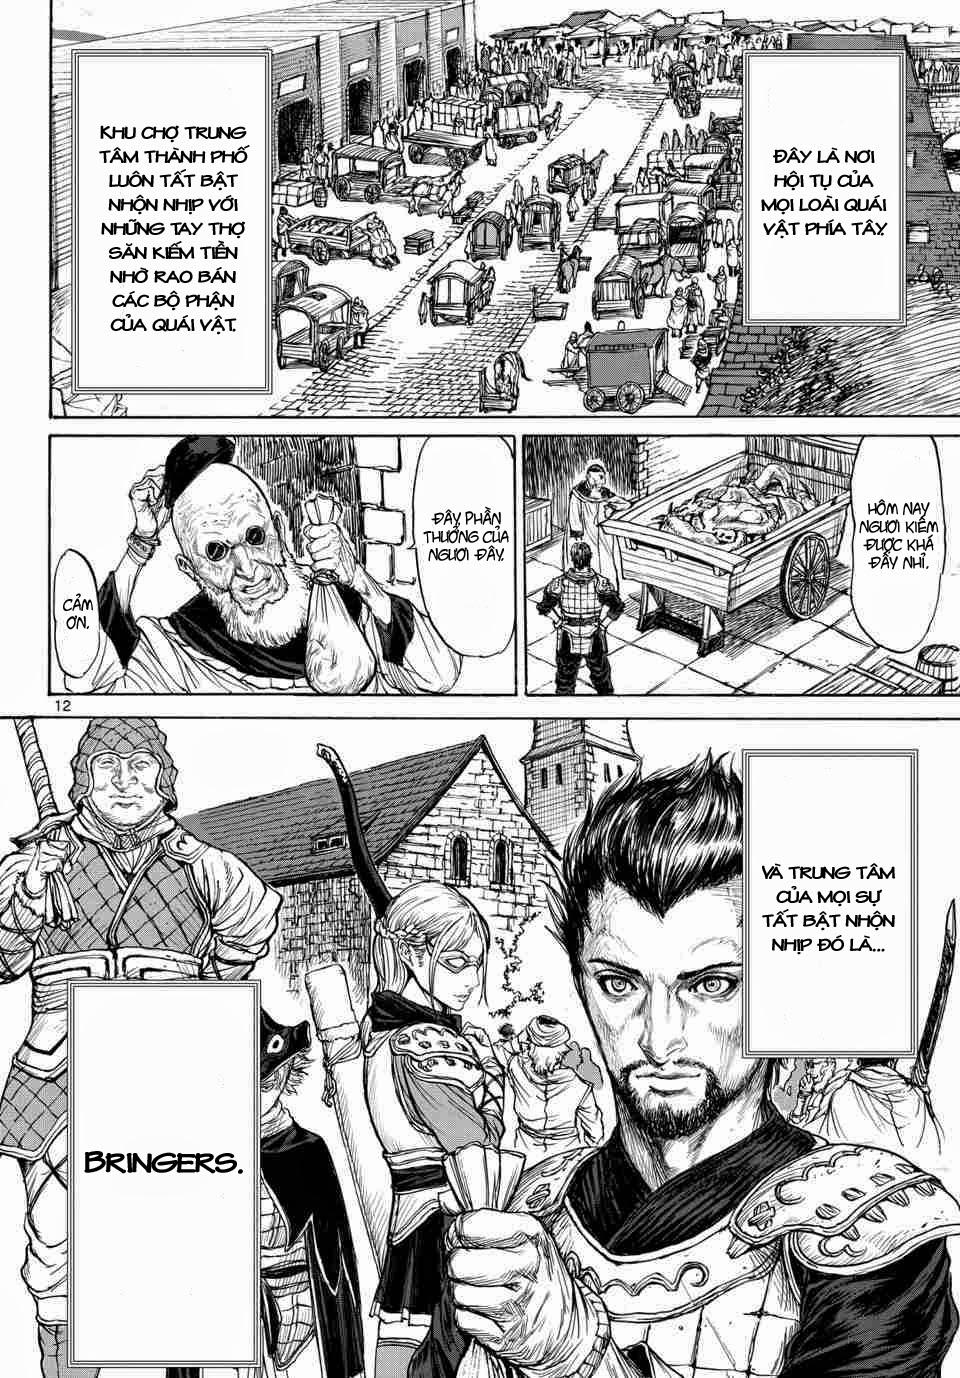 Monster X Monster chapter 1a trang 11